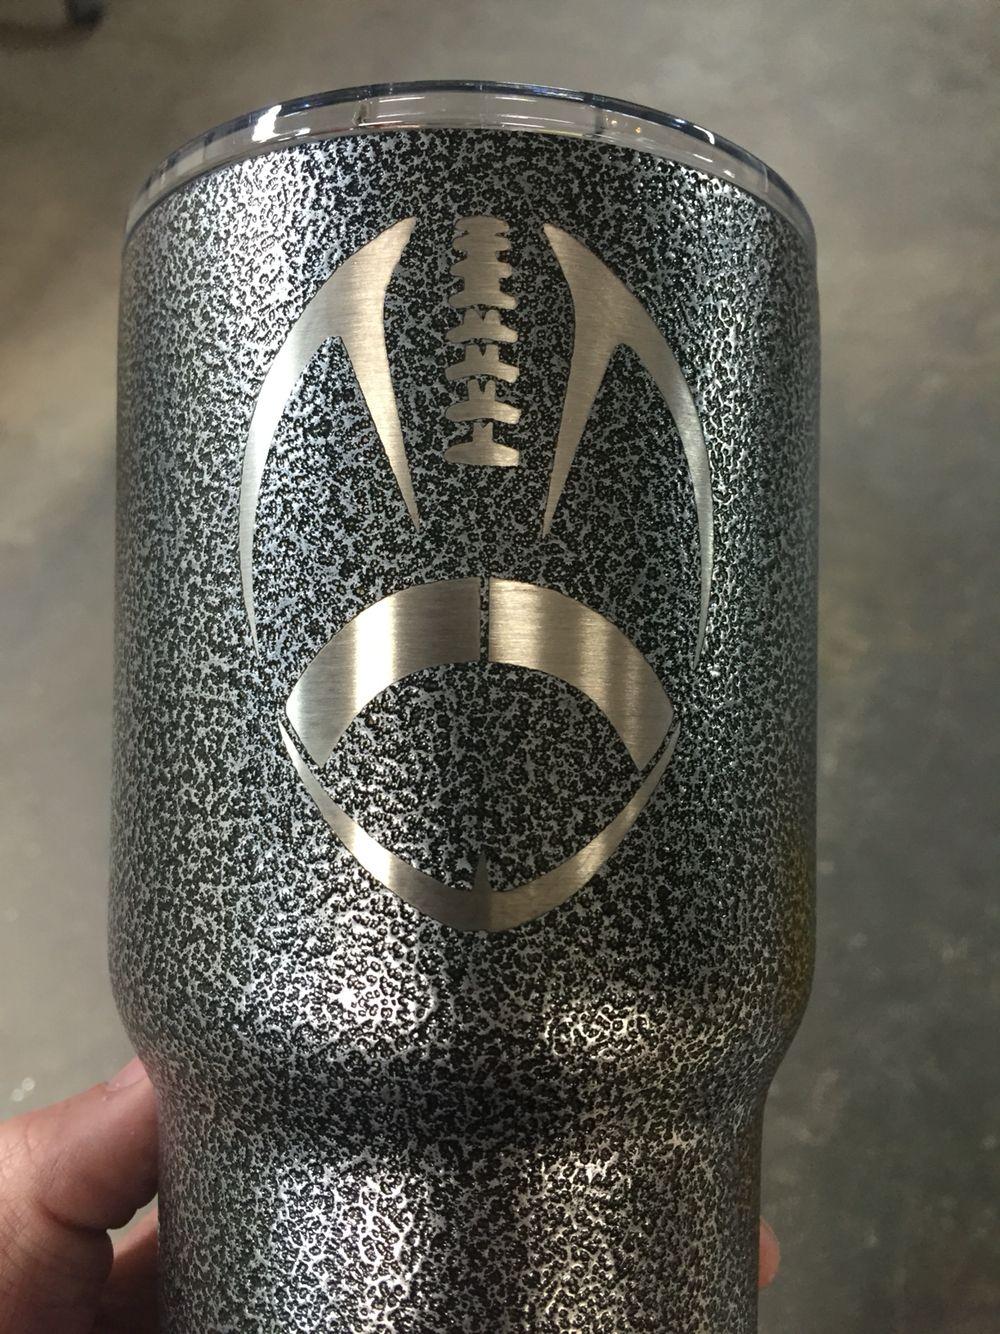 c44f435a448 Football on Silver texture powder coat. 30 oz Yeti Rambler ...